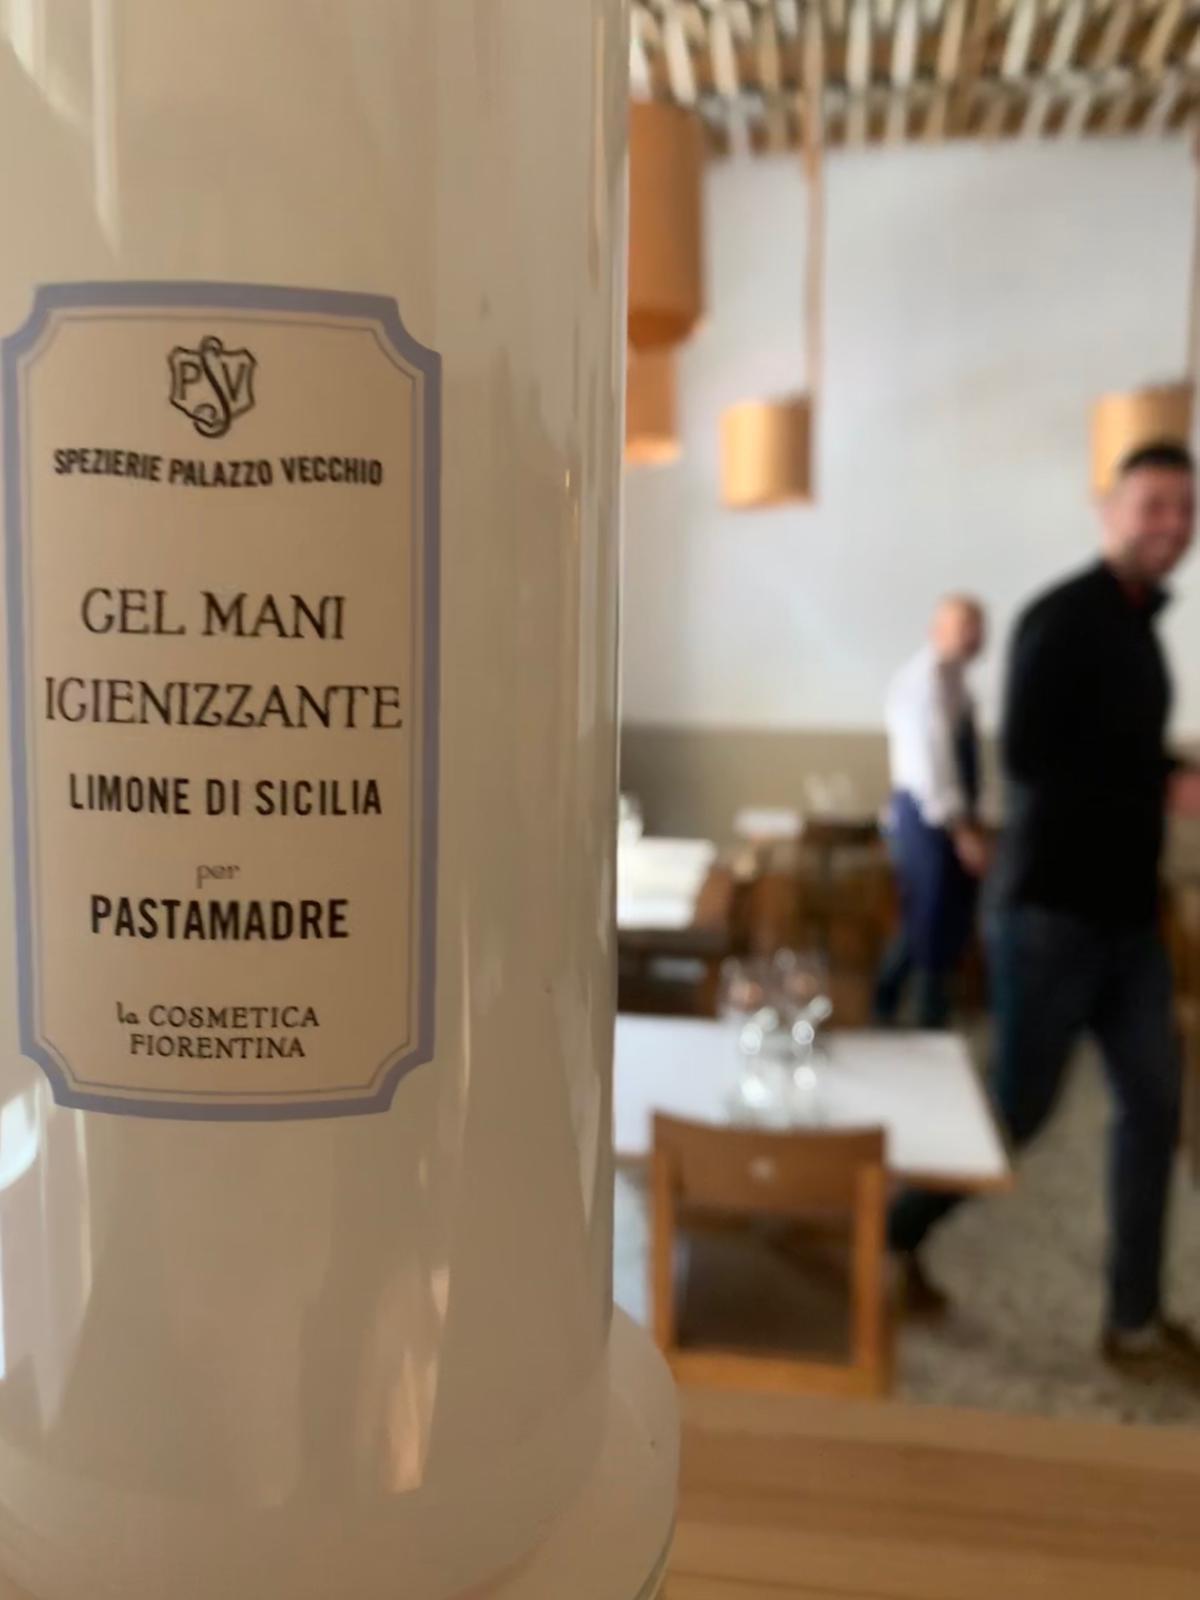 HAND SANITIZING GEL LEMON OF SICILIY-4929